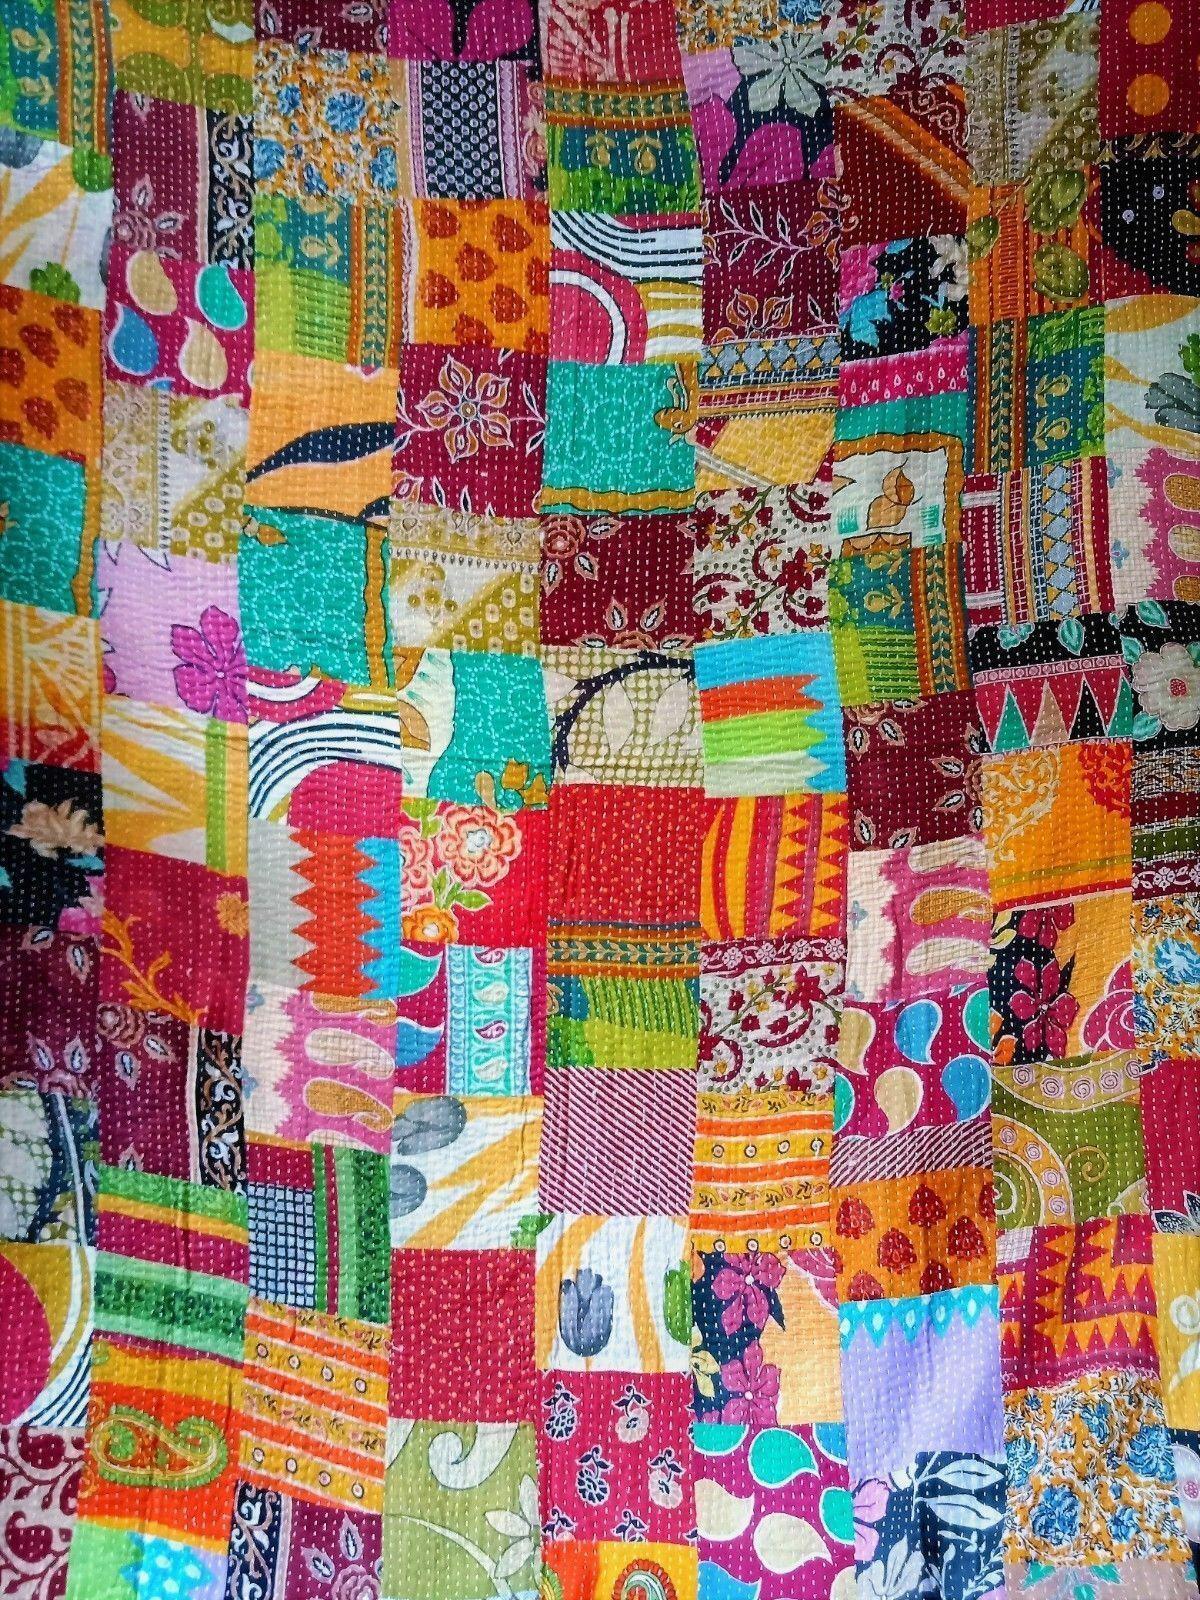 Indian Handmade Quilt Vintage Patchwork Kantha Bedspread Throw Cotton Blanket